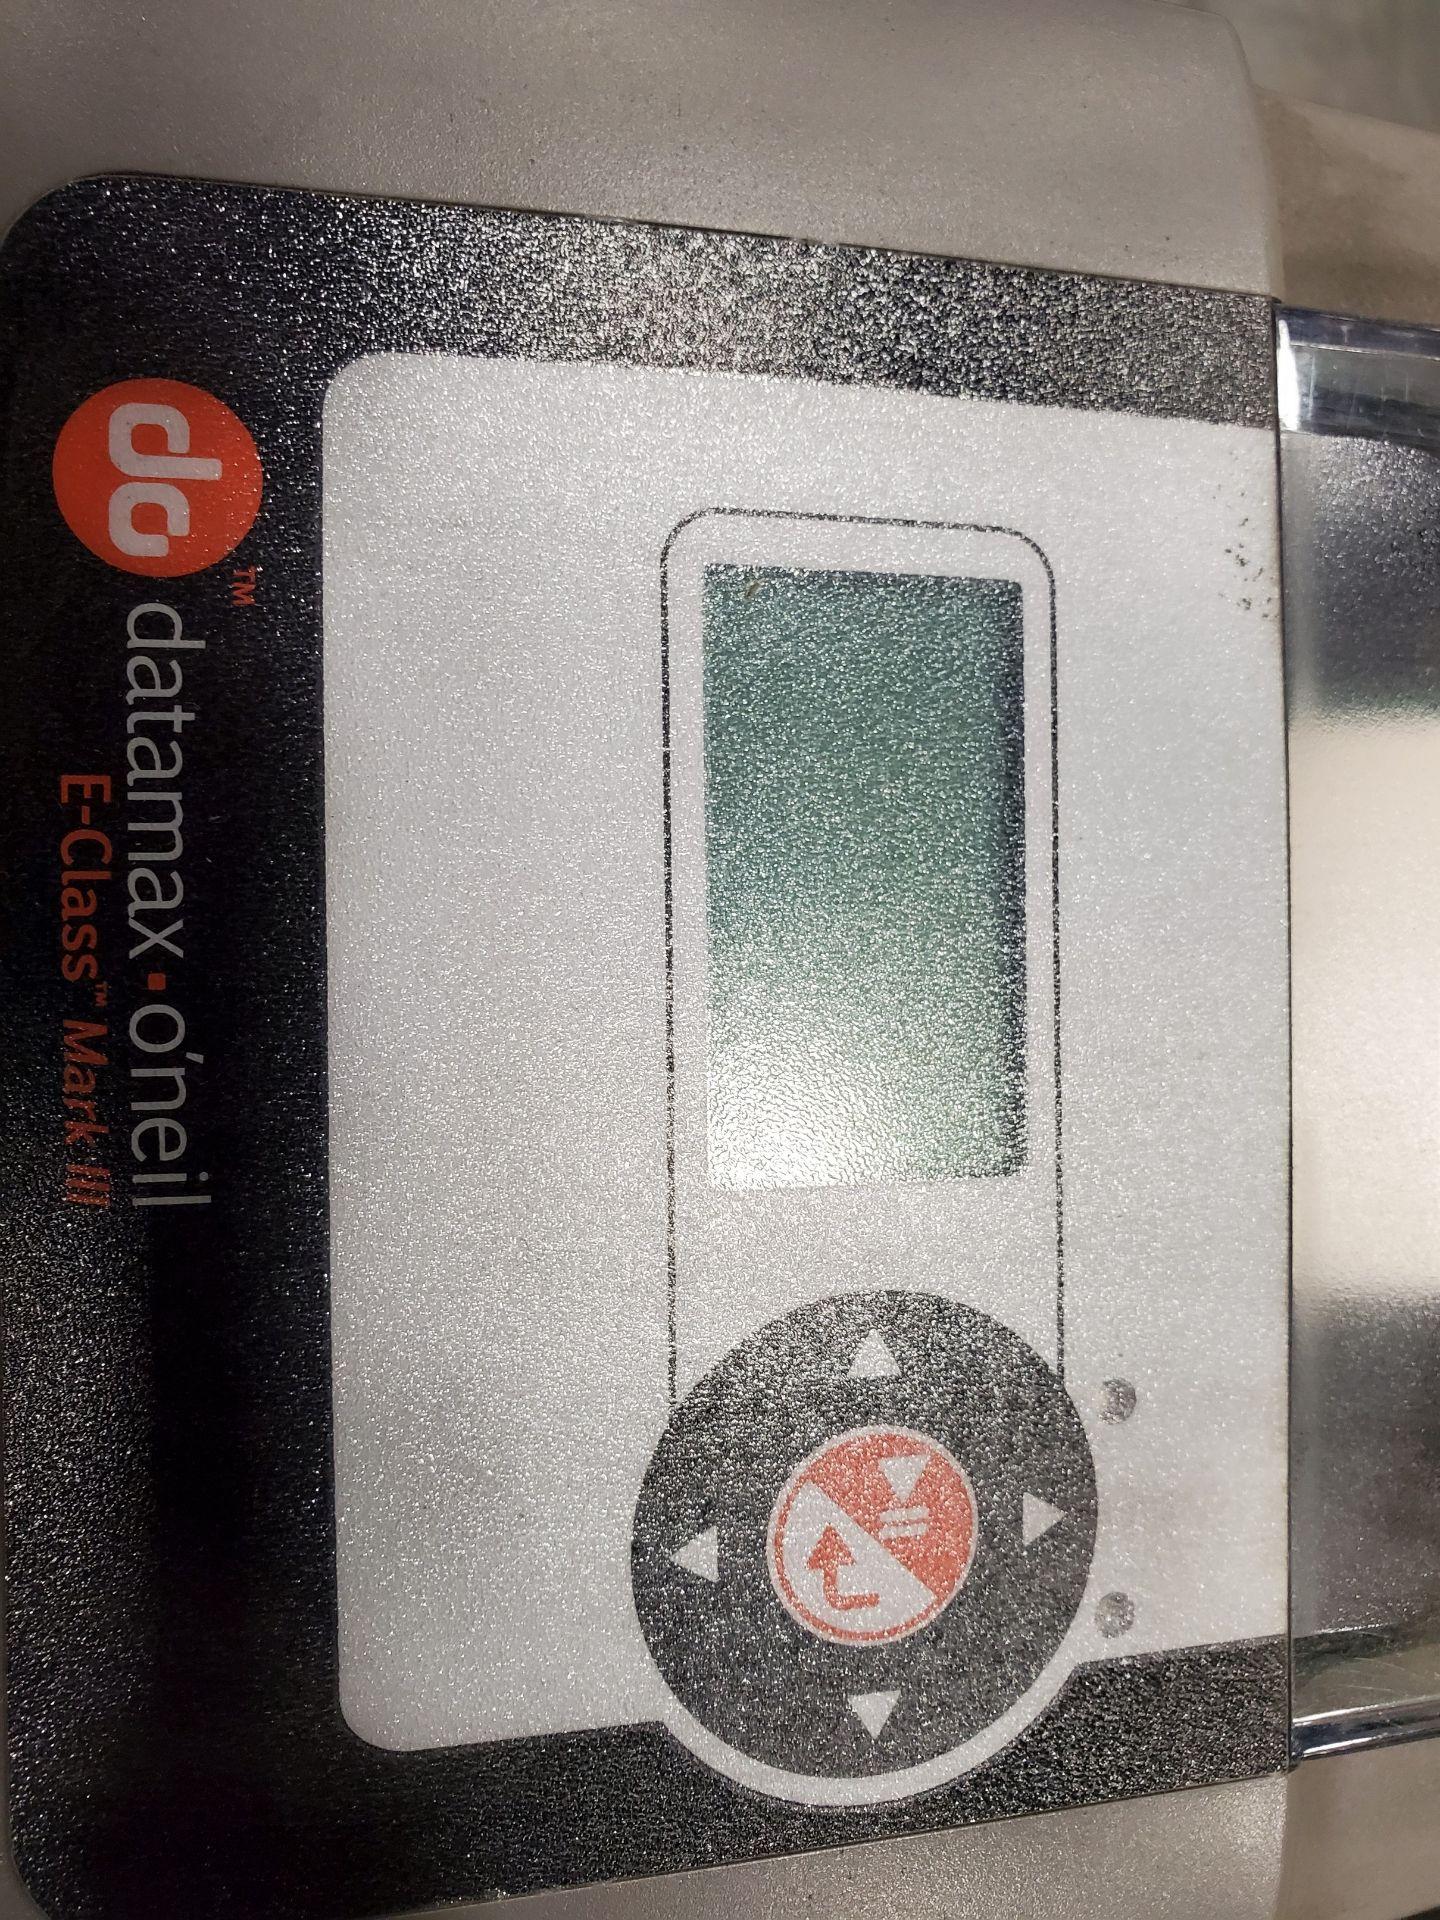 Lot 508 - (3) DATAMAX-O'NEIL THERMAL LABEL PRINTER, MODEL E-4206P, E-CLASS MARK 3 FAMILY WITH (3) POWER